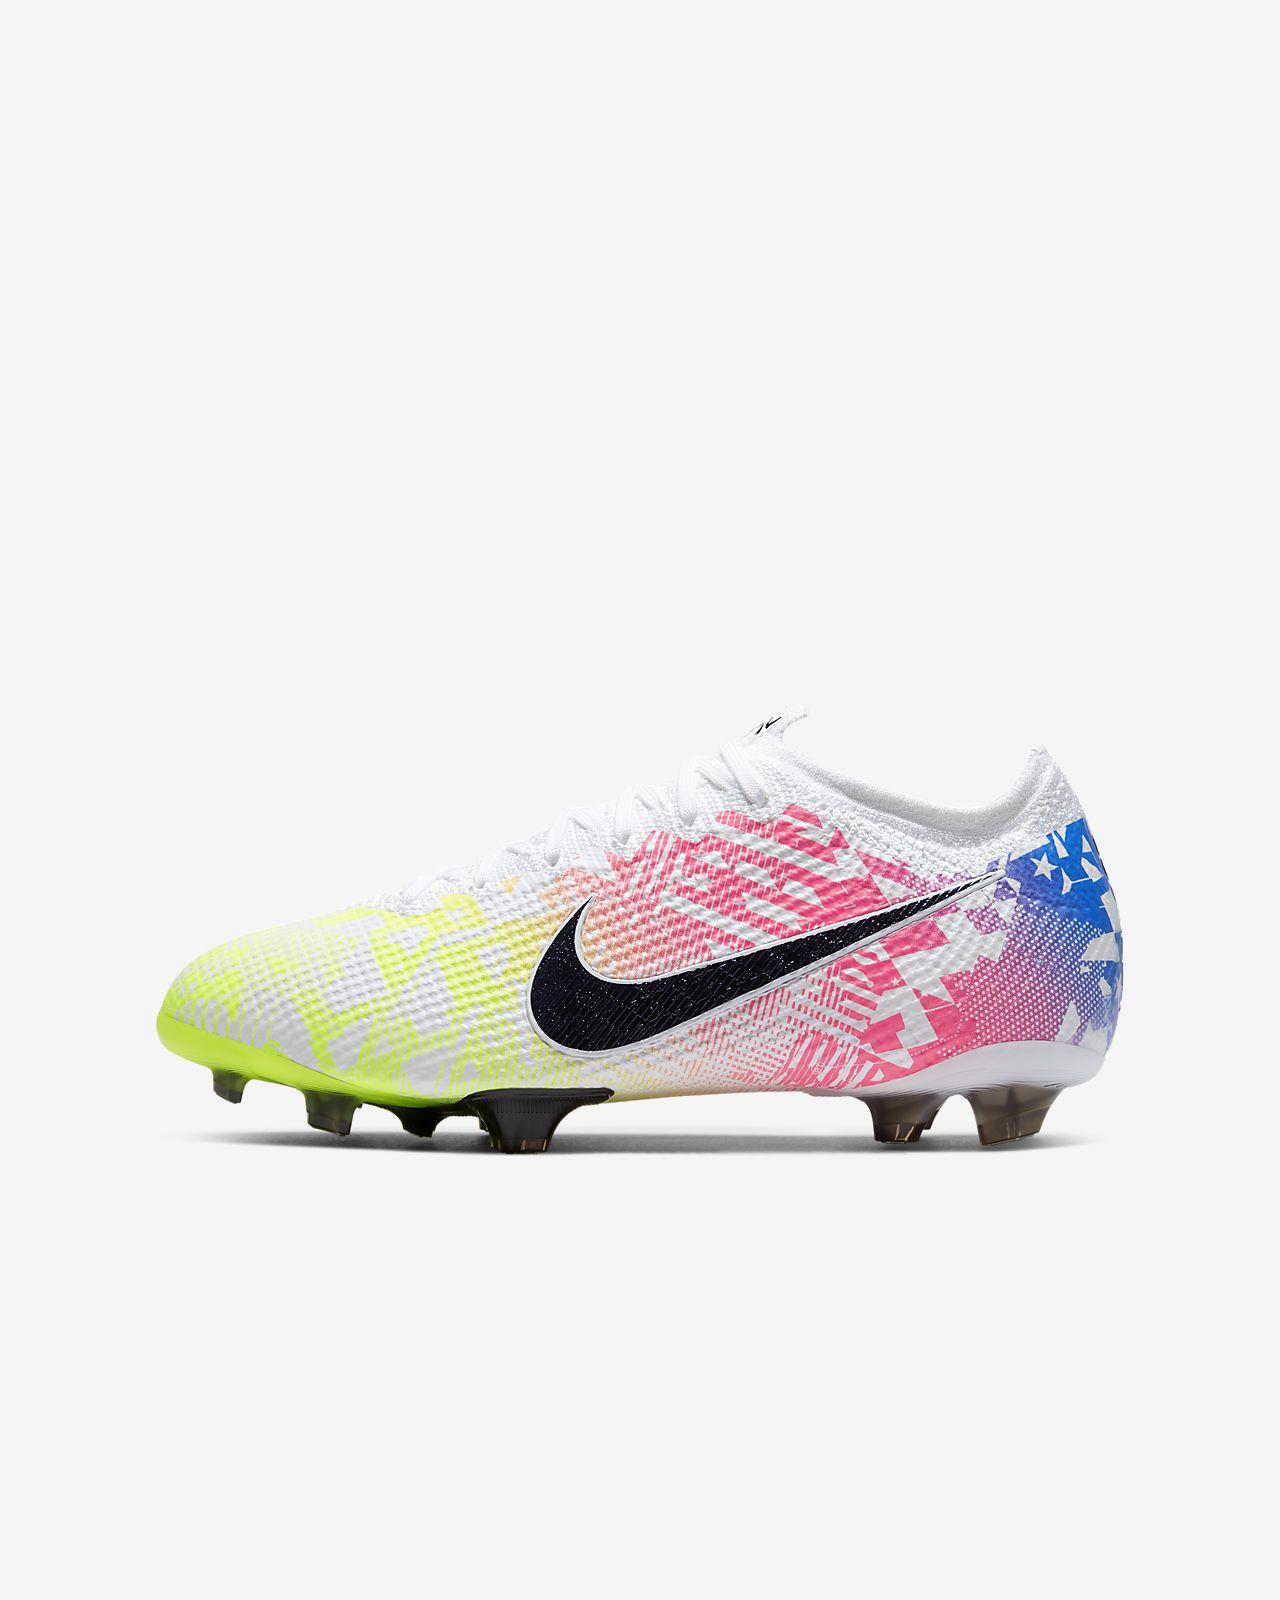 Nike Jr. Mercurial Vapor 13 Elite Neymar Jr. FG Kids' Firm-Ground Football Boot